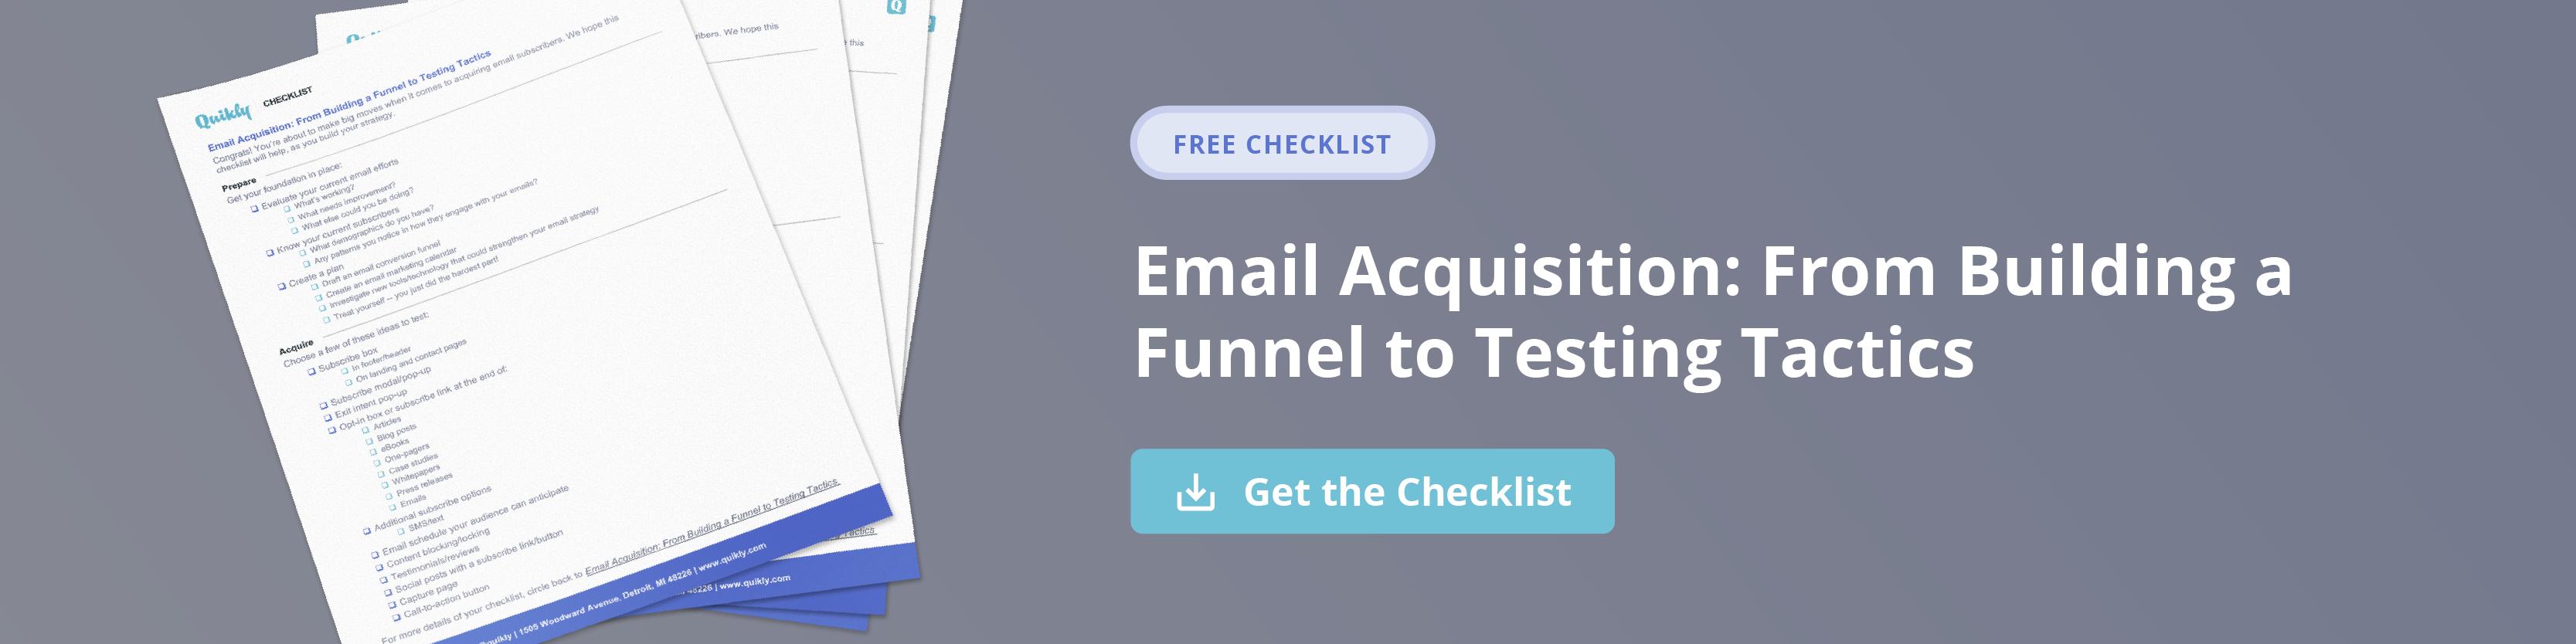 email-acquisition-checklist-cta